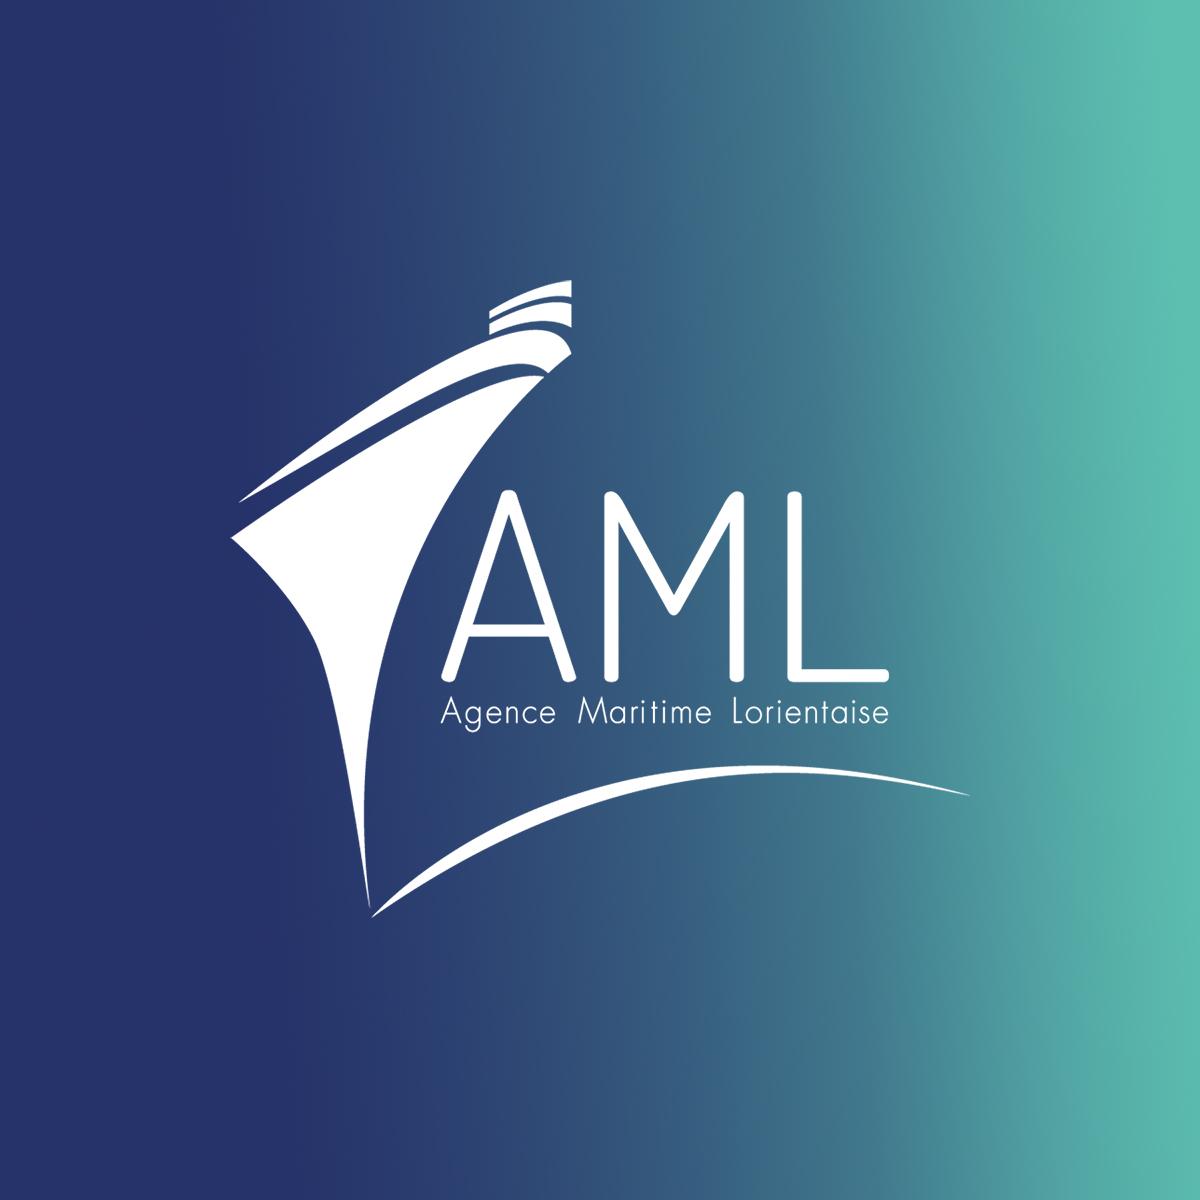 Agence Maritime Lorientaise logo